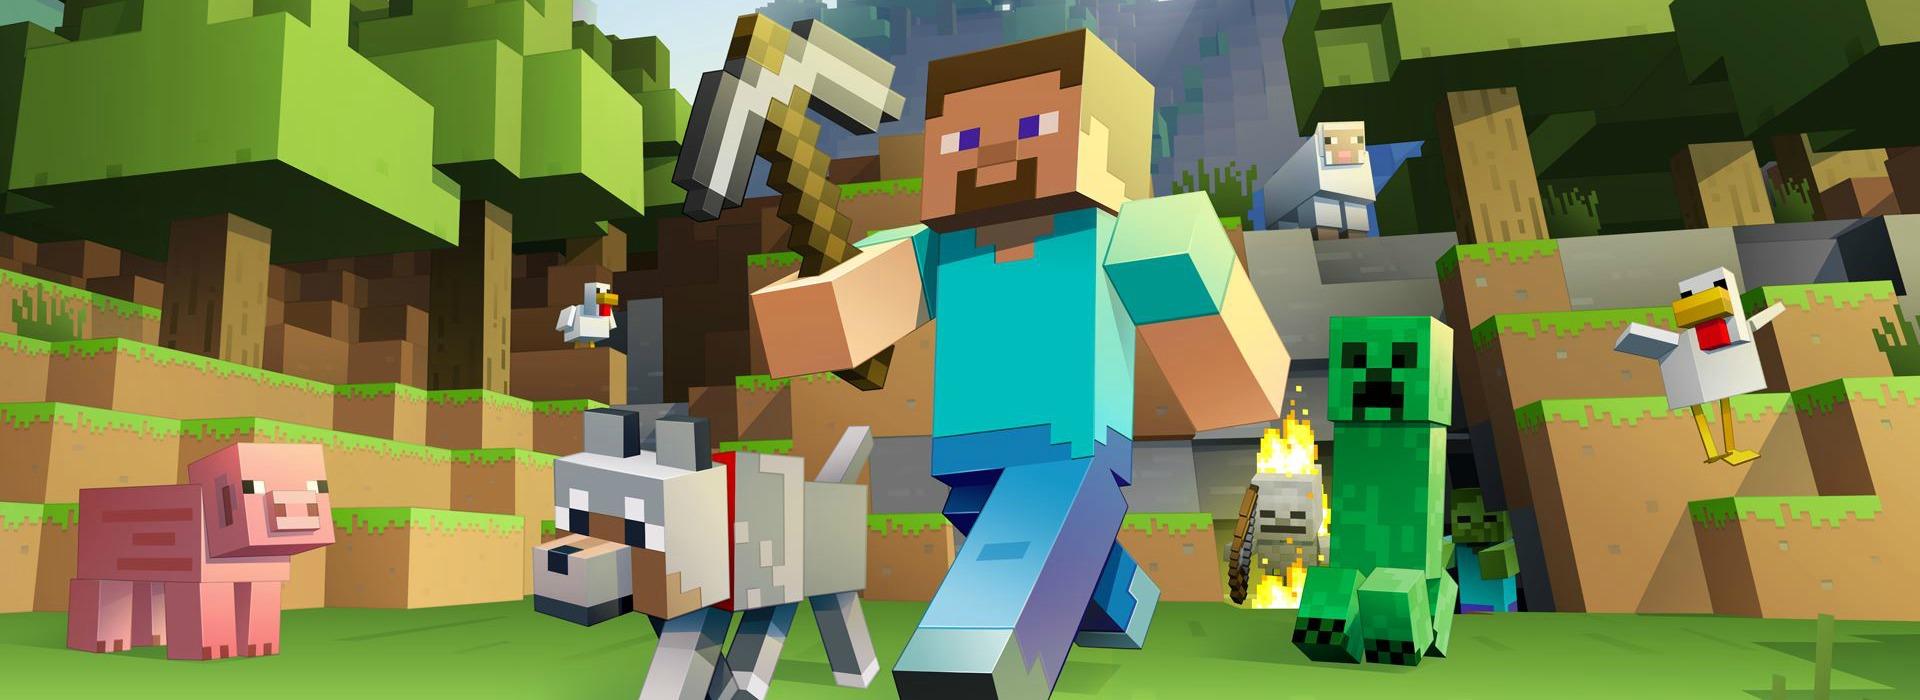 Minecraft Wii U Edition Wii U Nintendo Insider